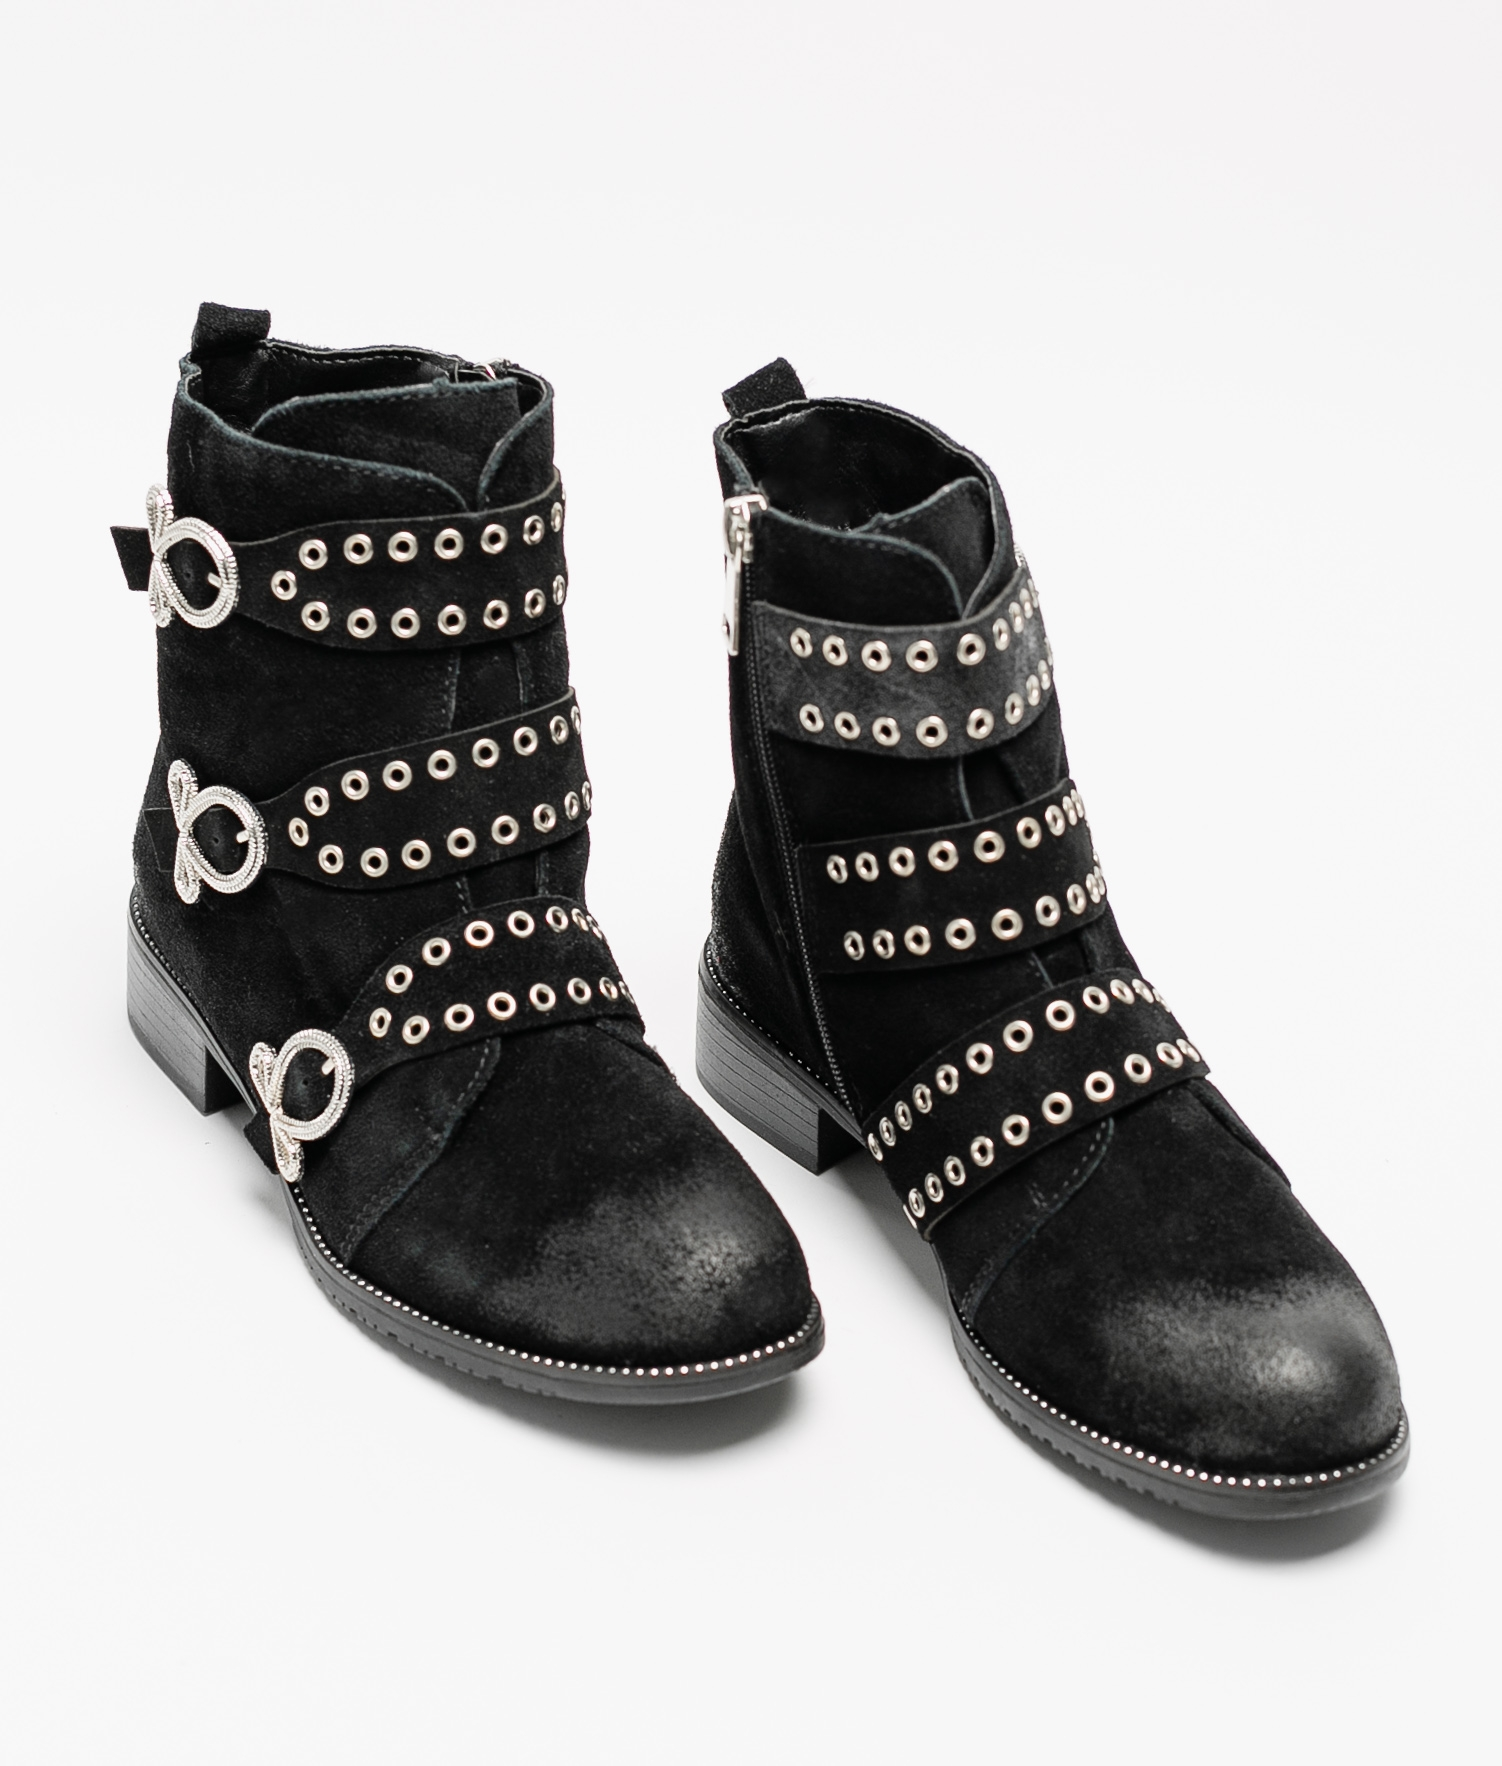 Finler Low Boot - Black